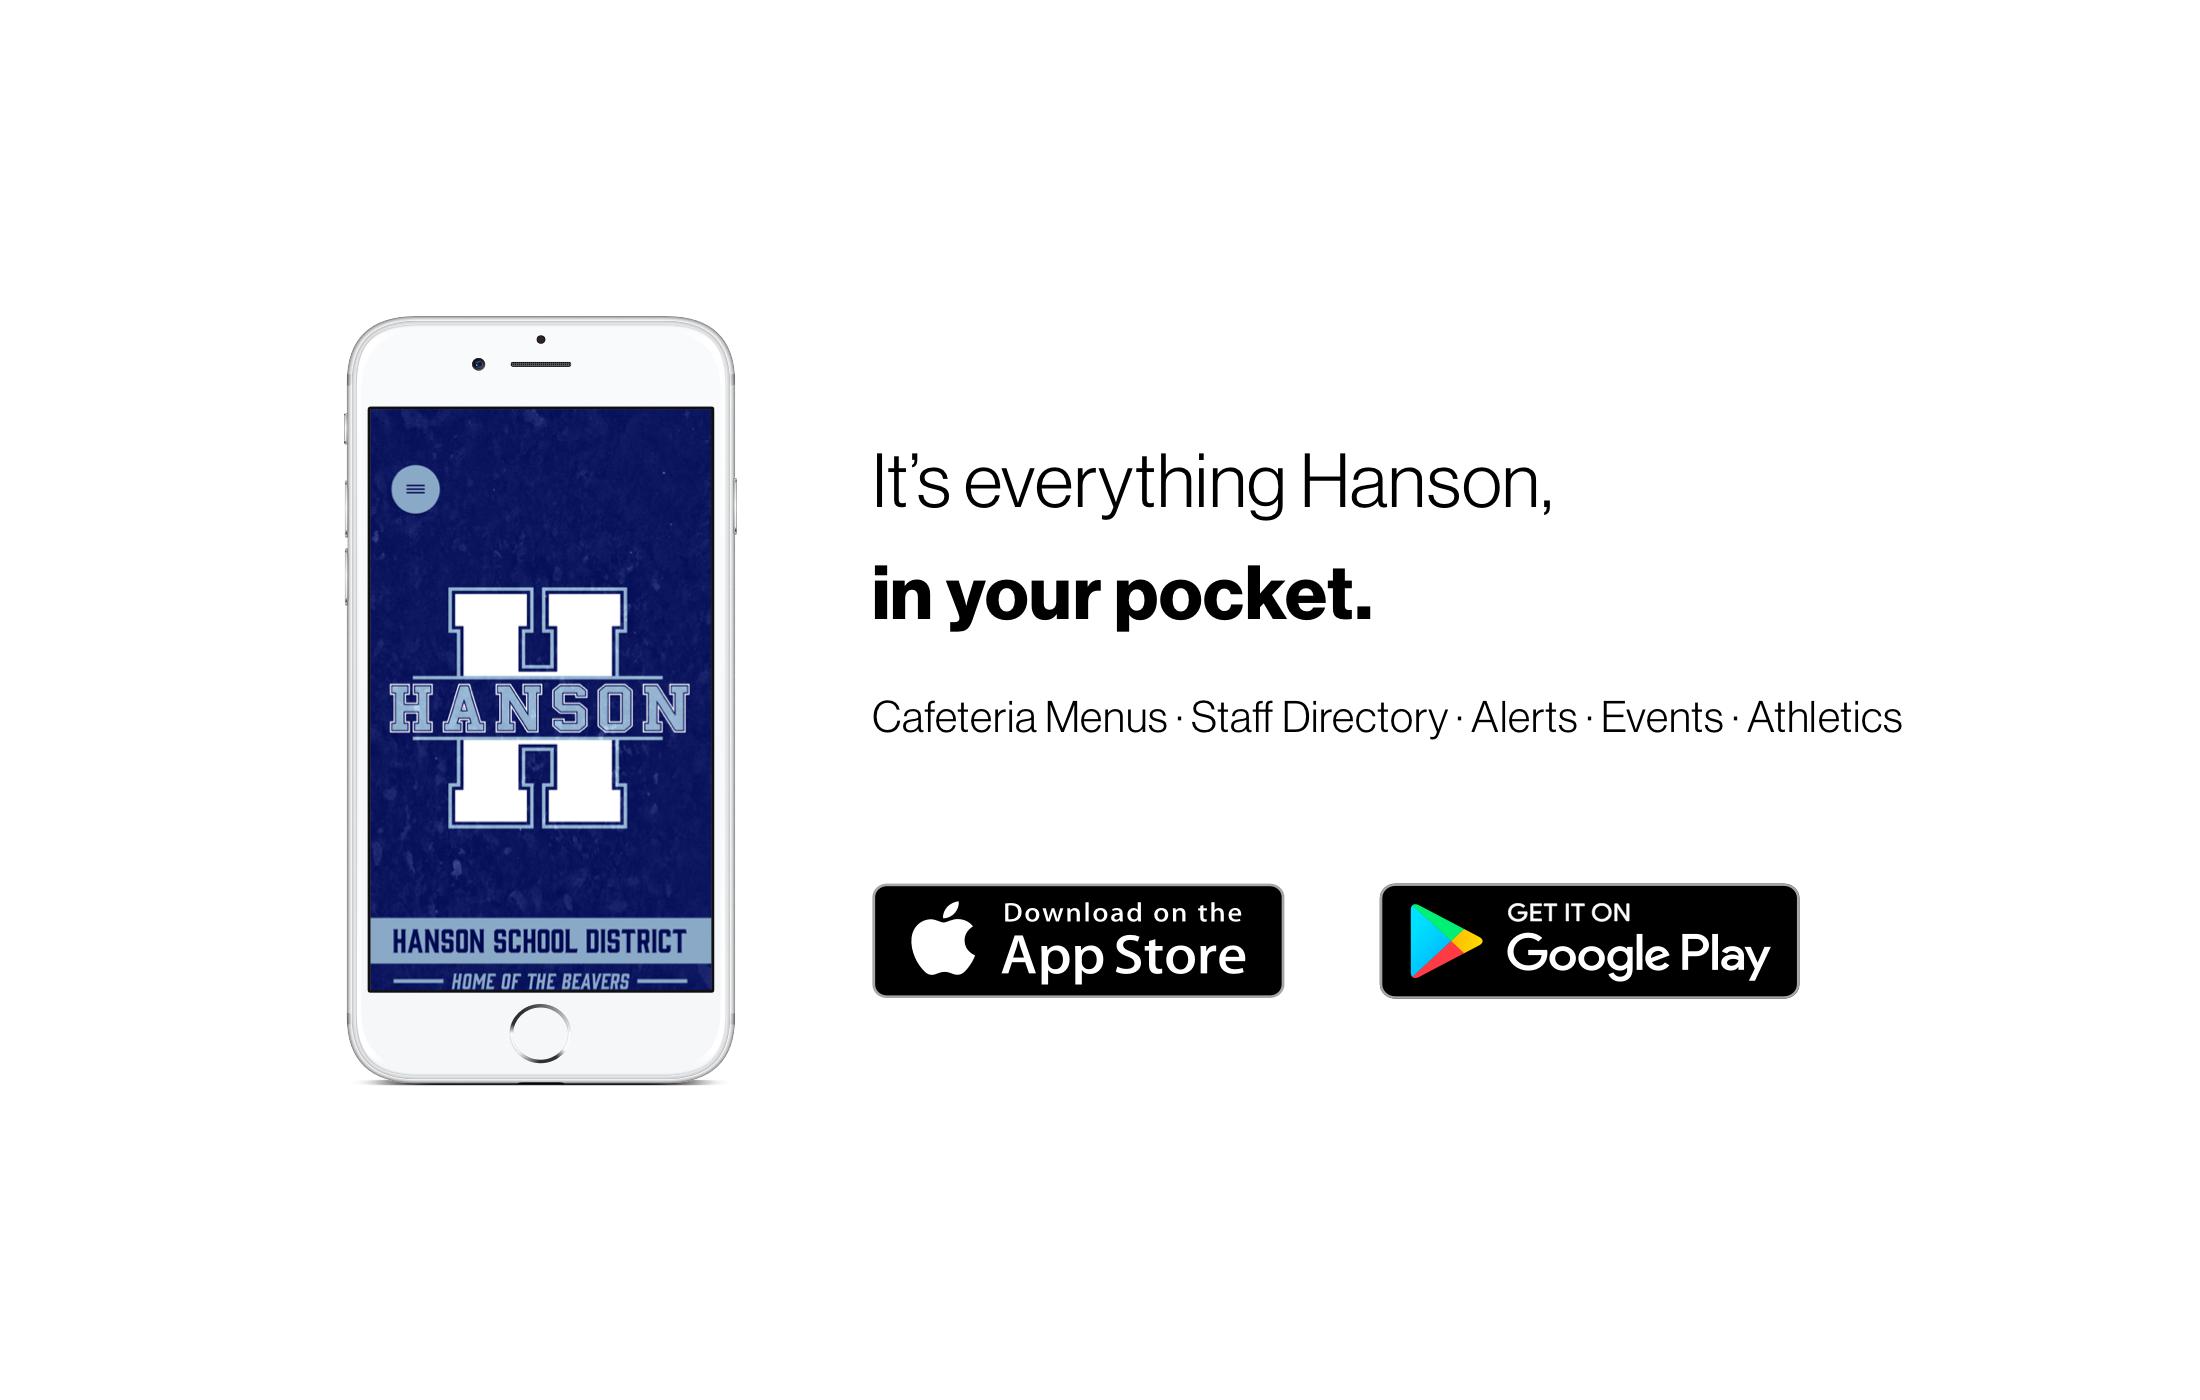 Hanson App promotion